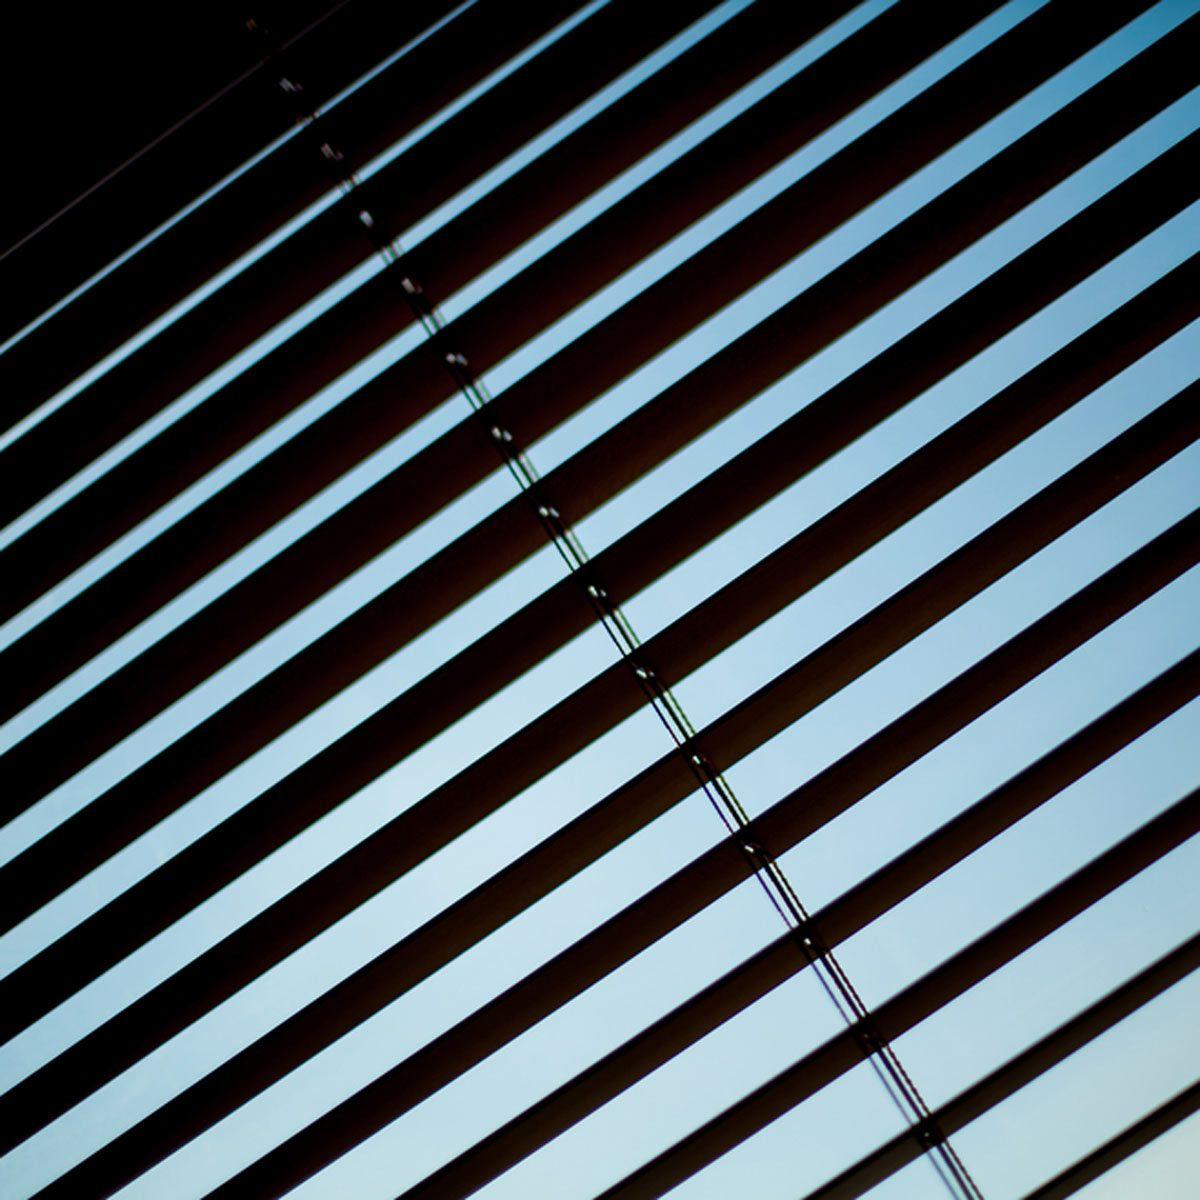 dfh35_shutterstock_607109375 window blinds